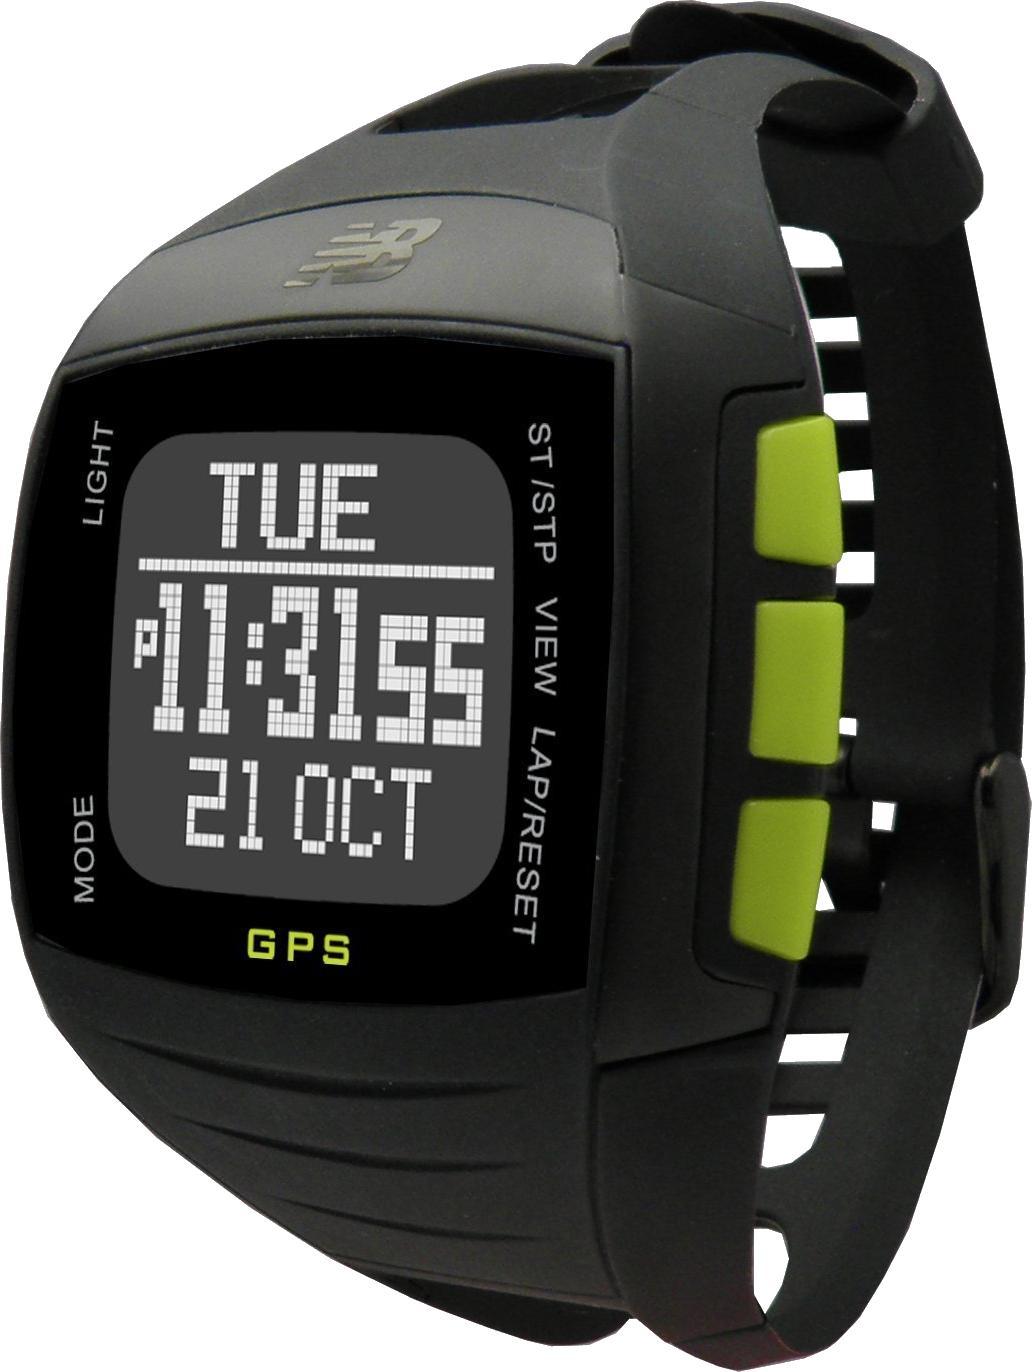 New Balance GPS Cardio Trainer